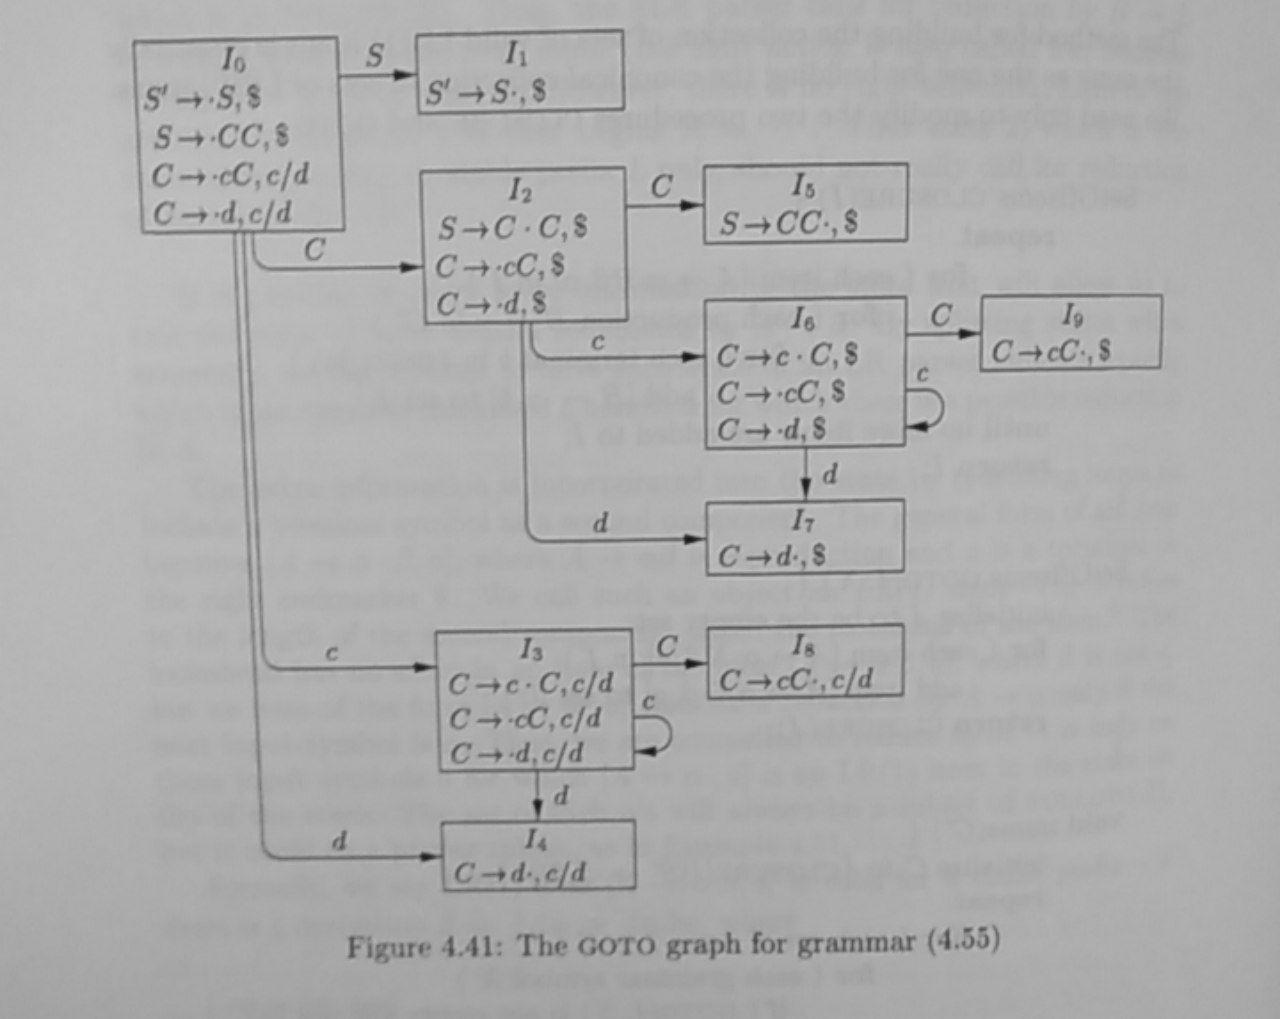 LR(1) example 1